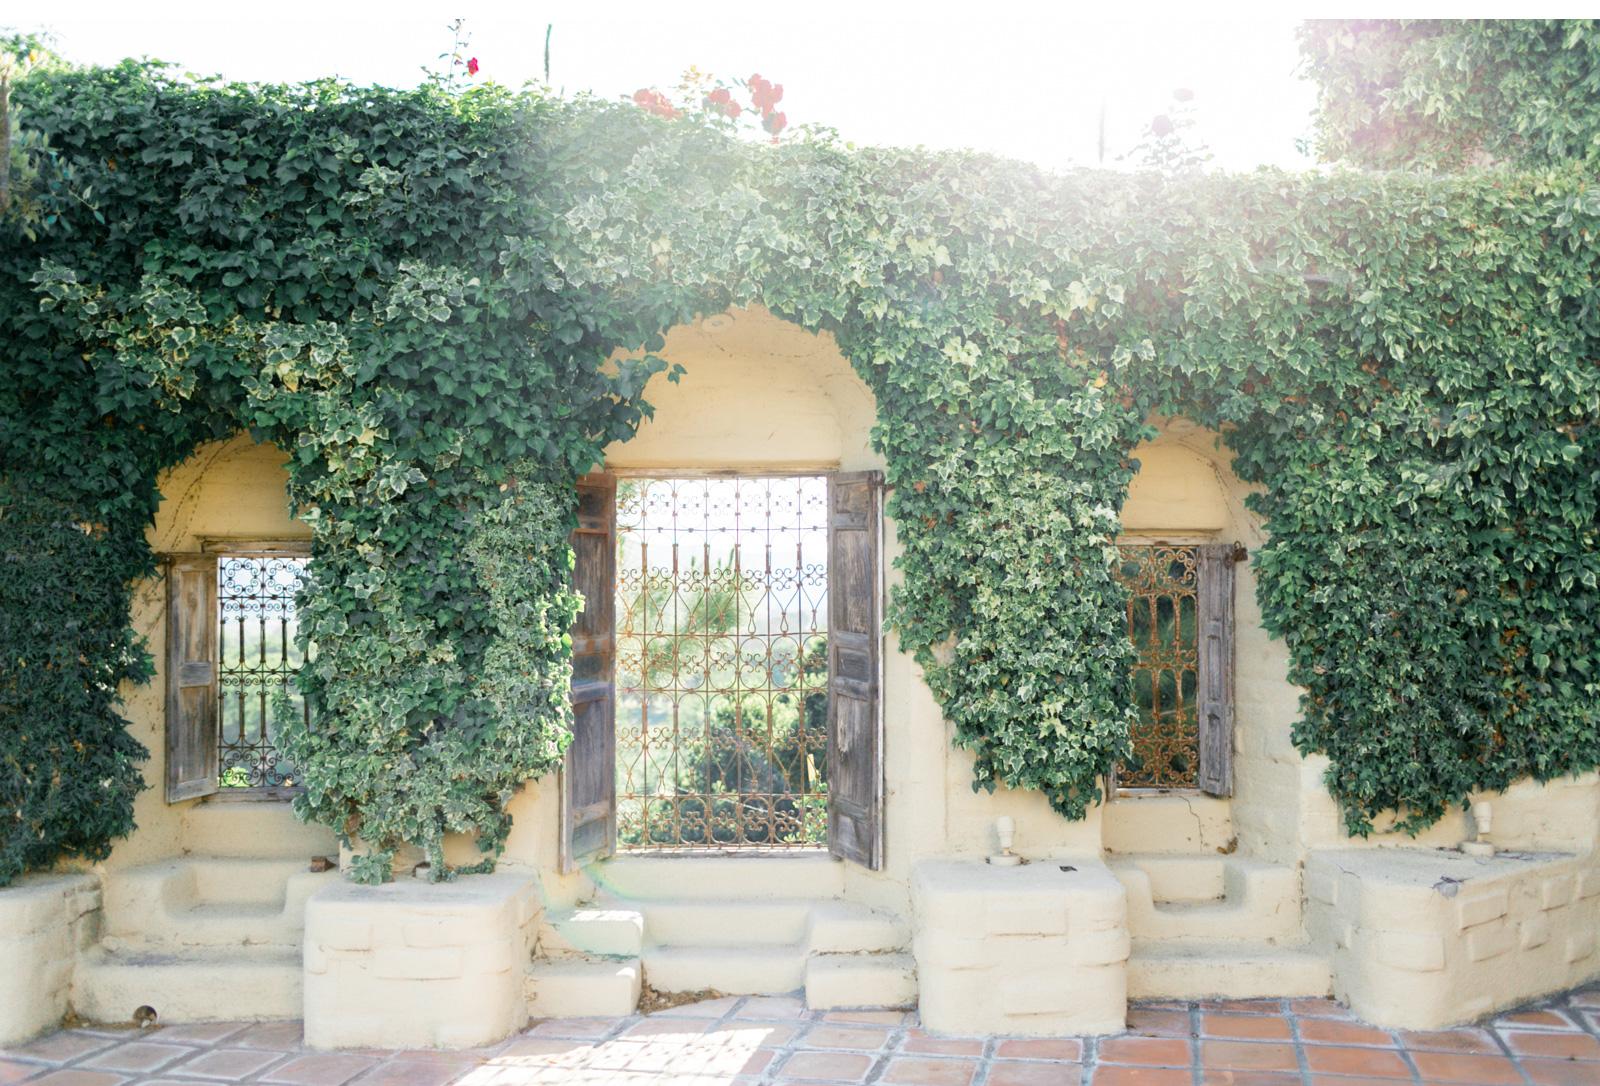 San-Luis-Obispo-Wedding-Photographer-Hammersky-Vineyard-Natalie-Schutt-Photography_04.jpg